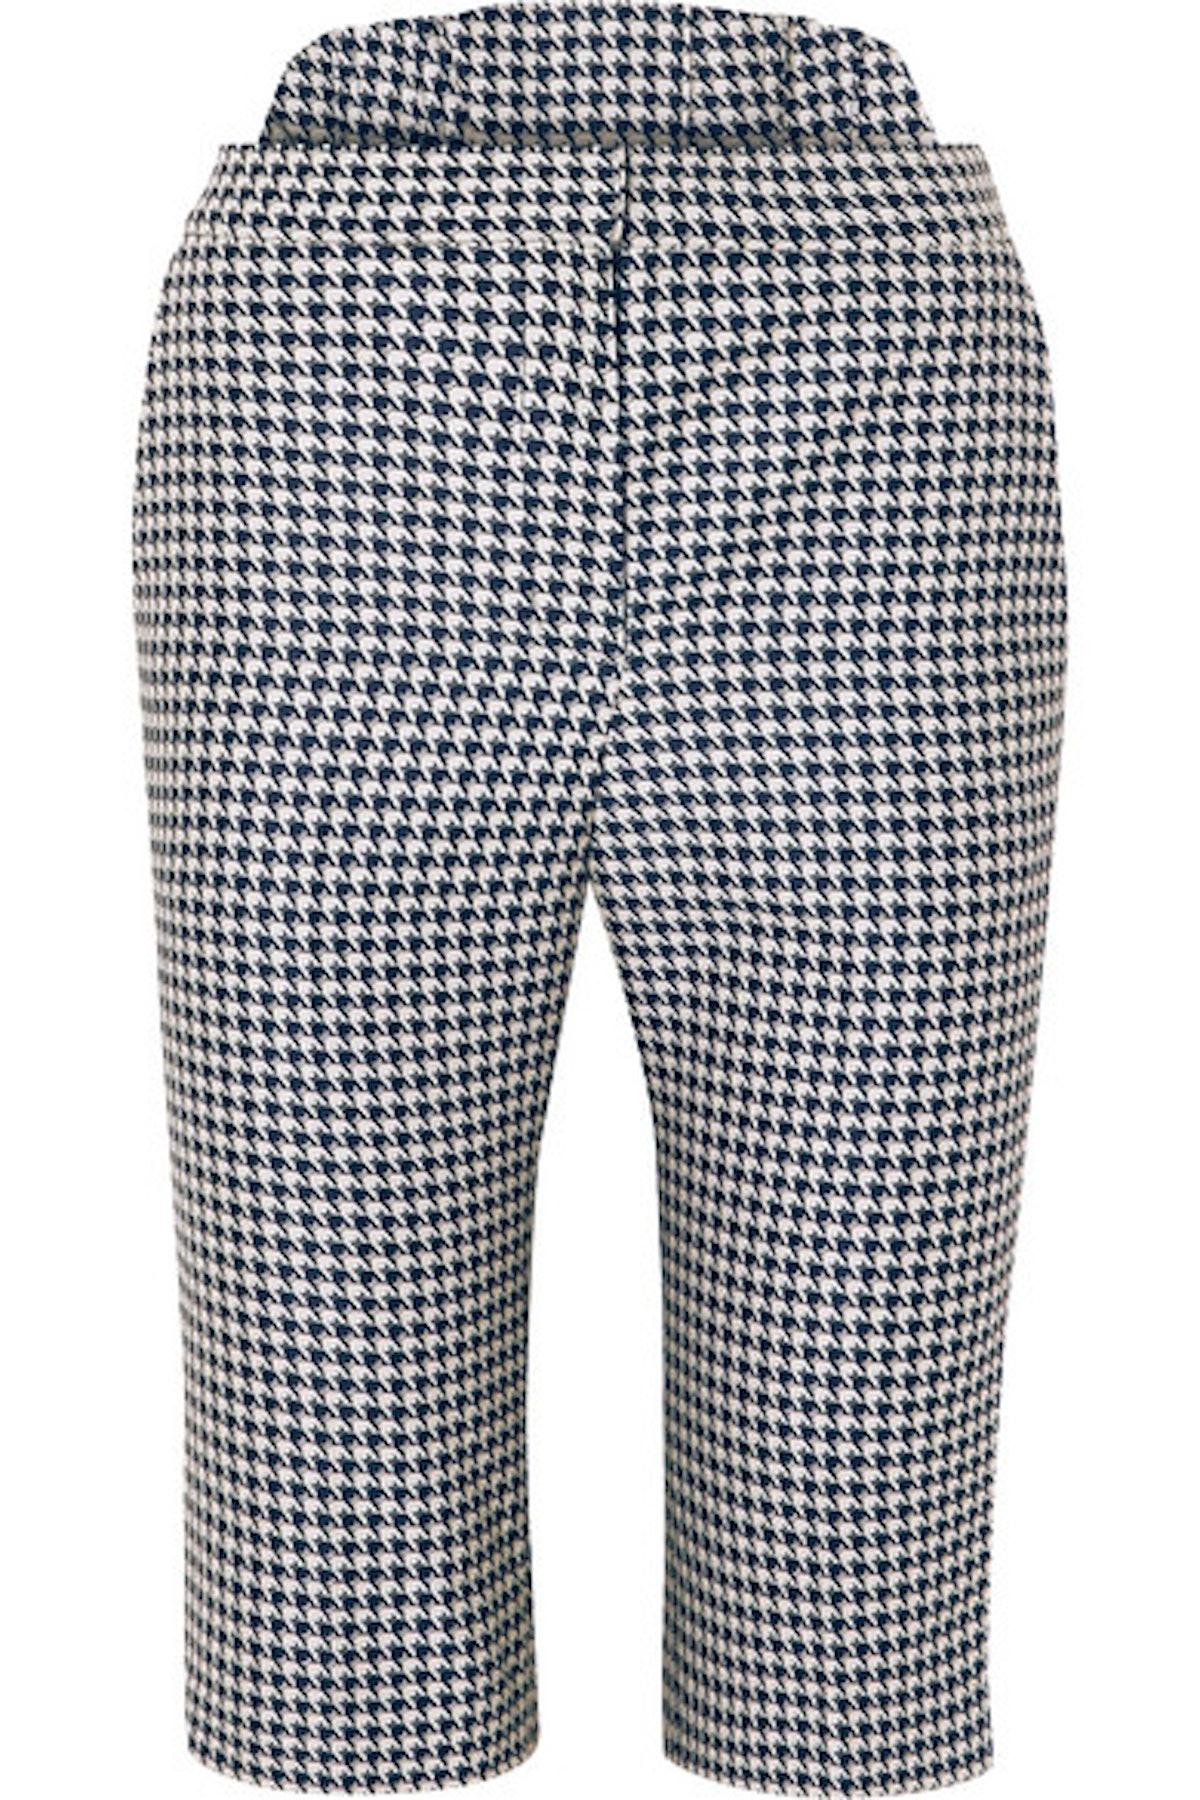 Houndstooth Jacquard Shorts